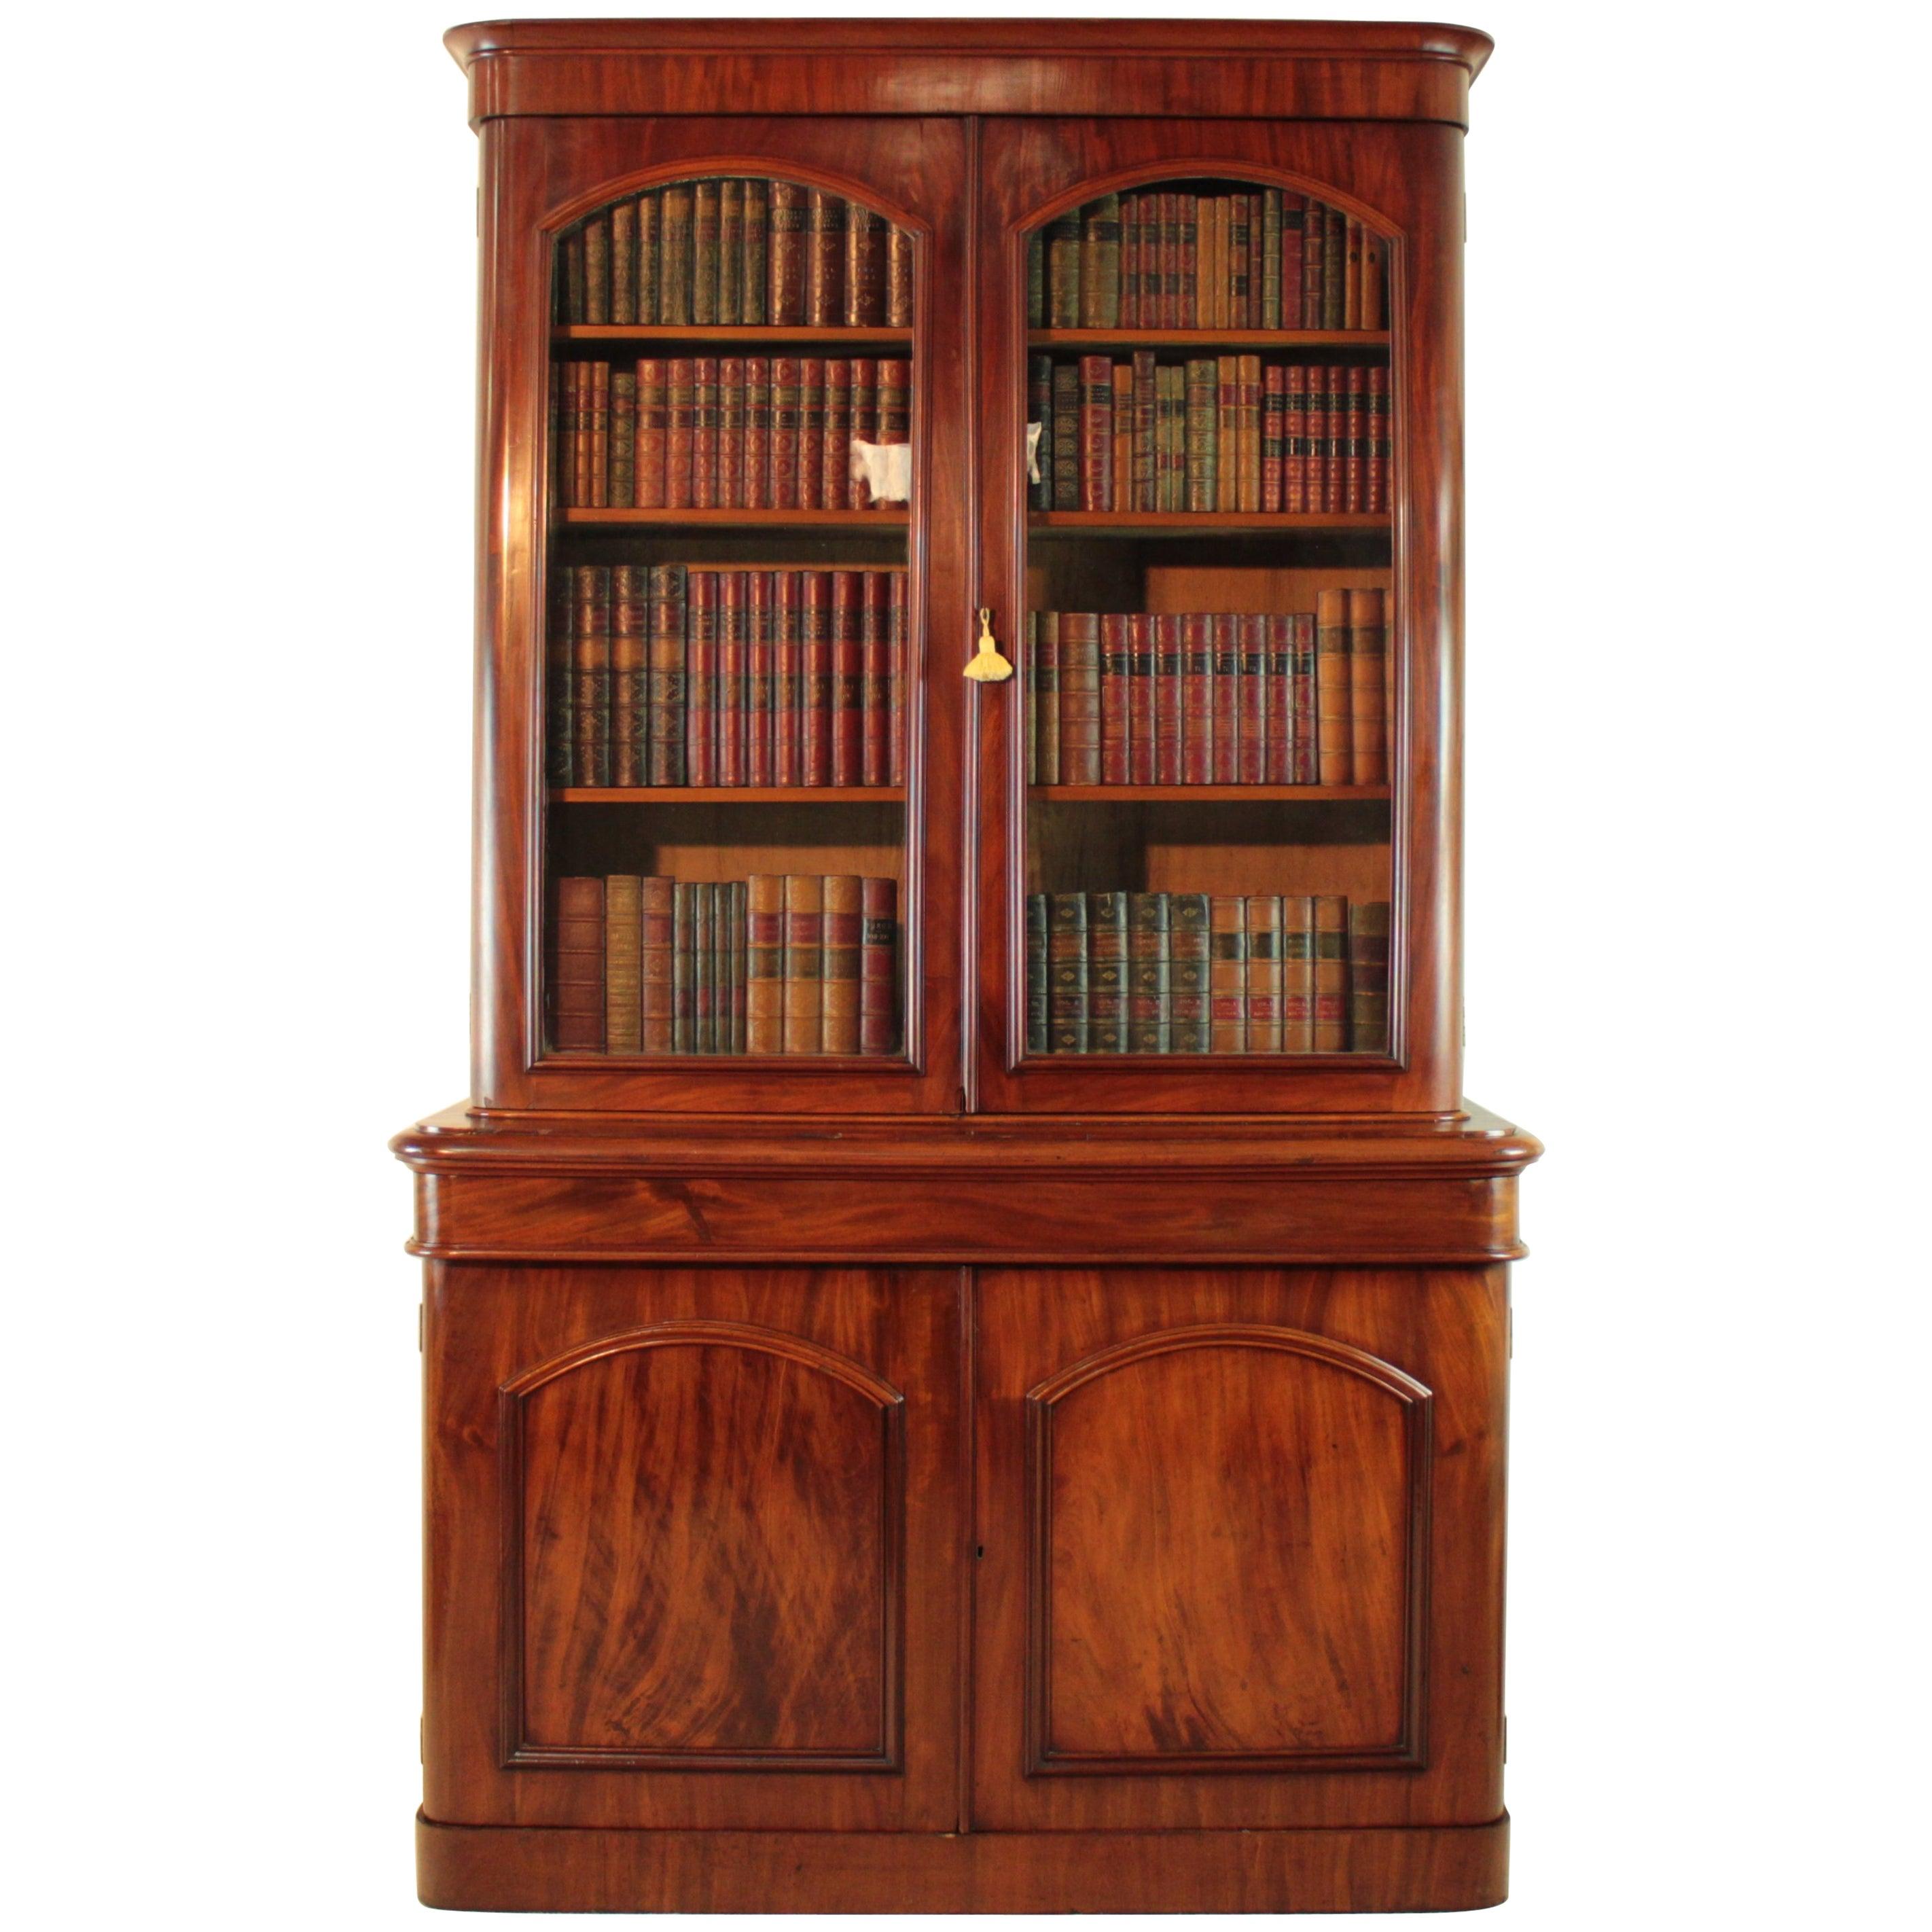 Antique Victorian Mahogany Two-Door Bookcase, English, circa 1870